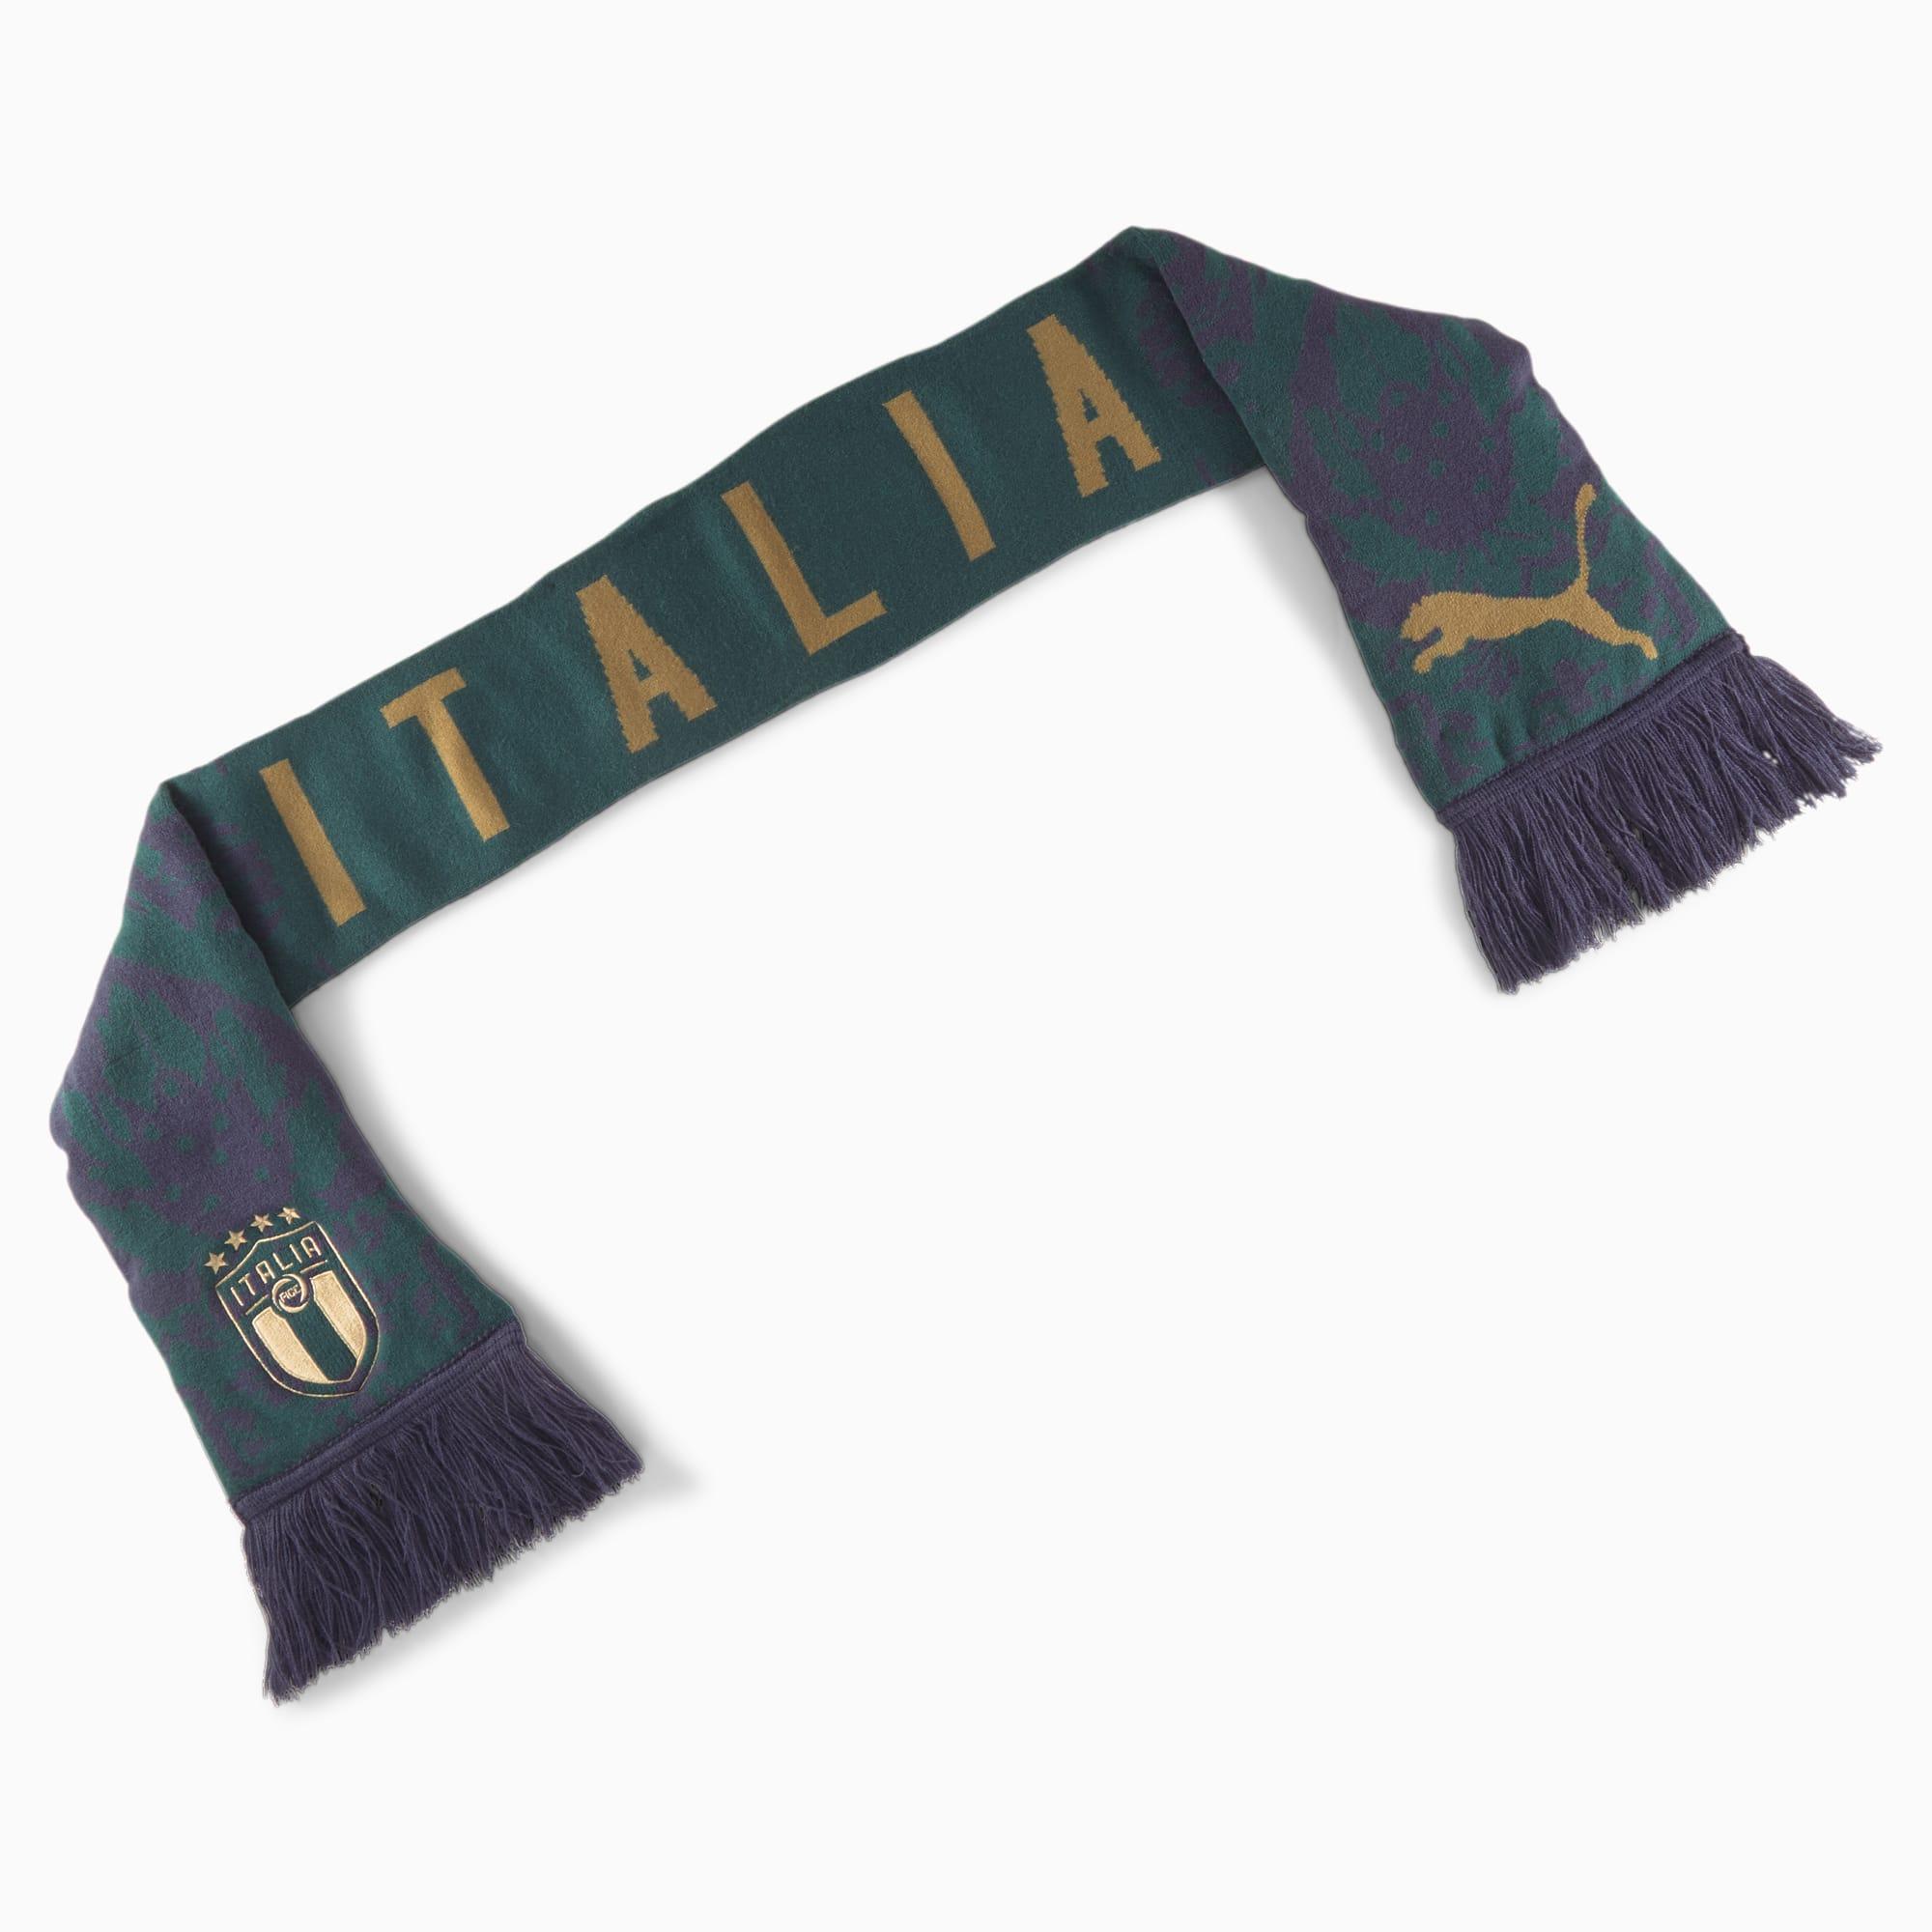 Écharpe italia football culture, vert/bleu, vêtements